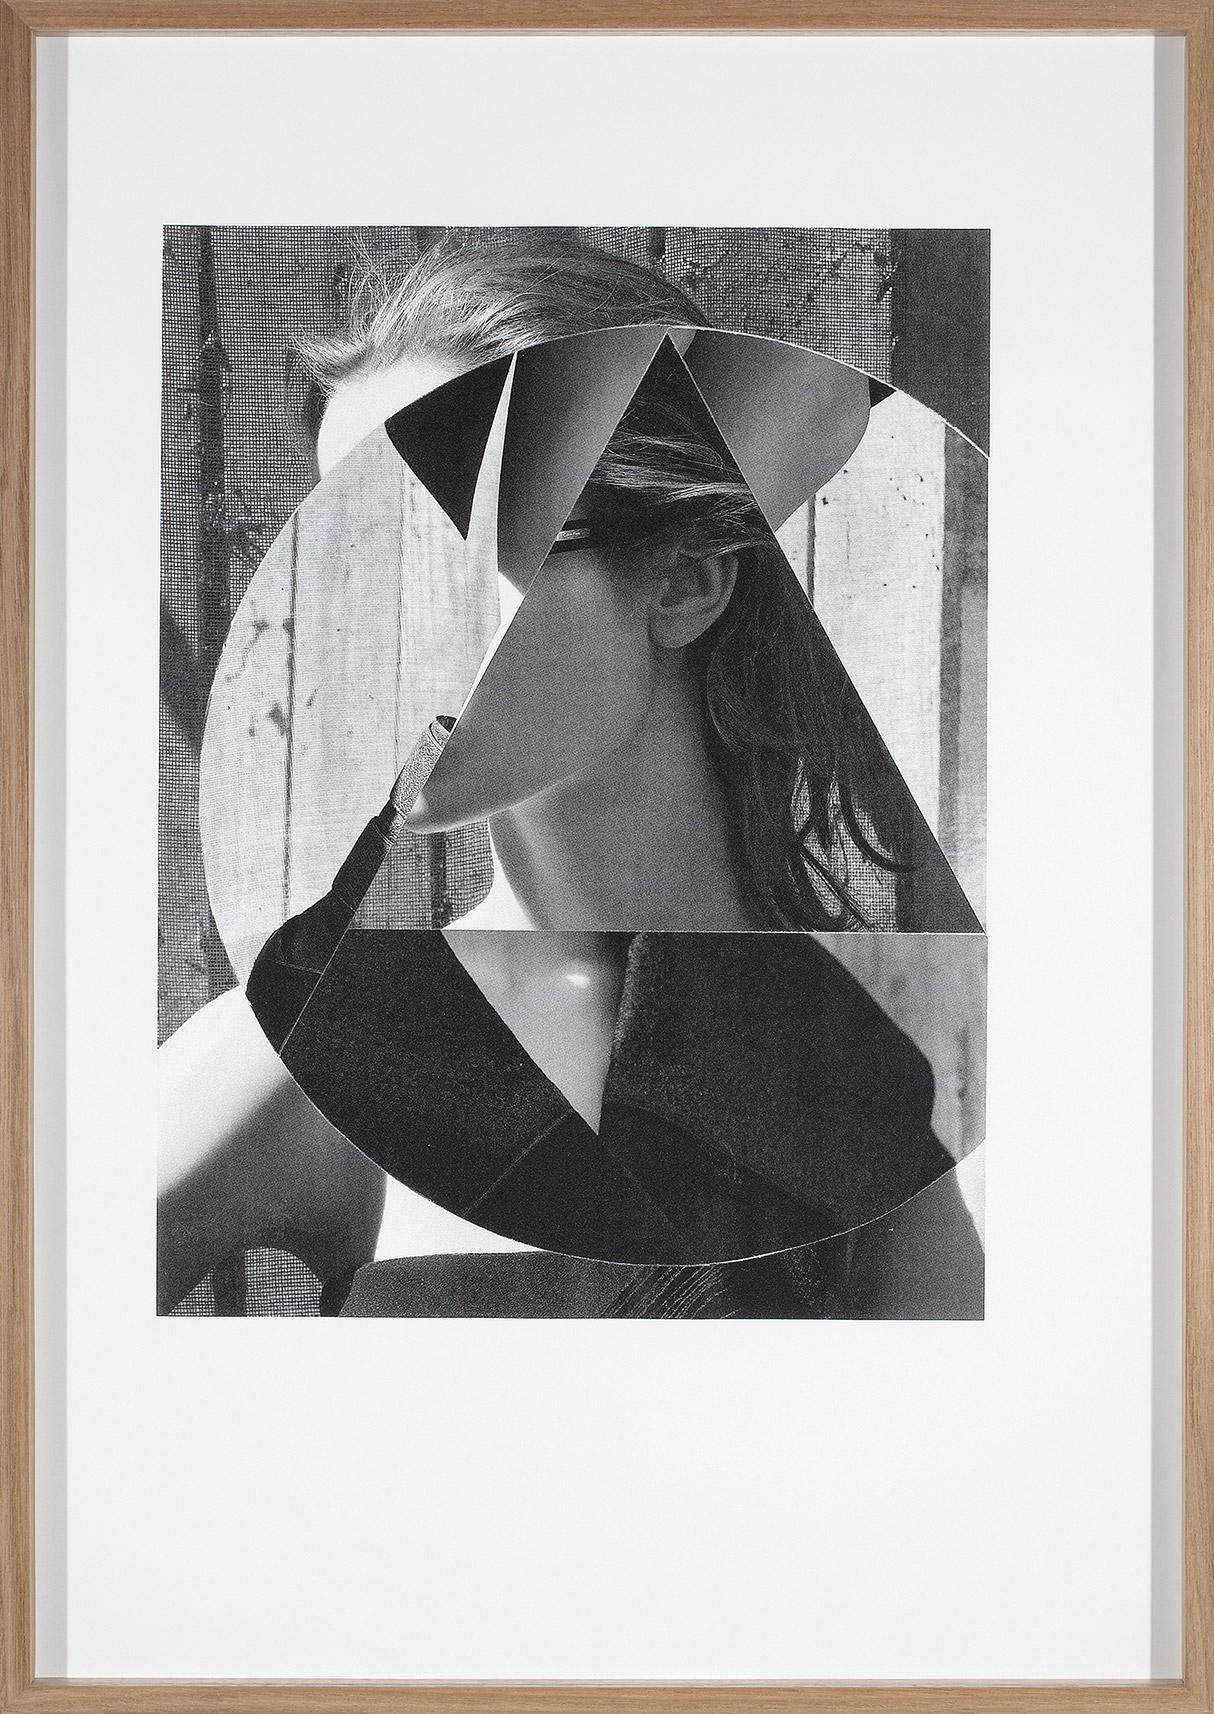 Brad Haylock,  Still Discontent CK66 , 2011, pigment print on paper, 84 x 59cm